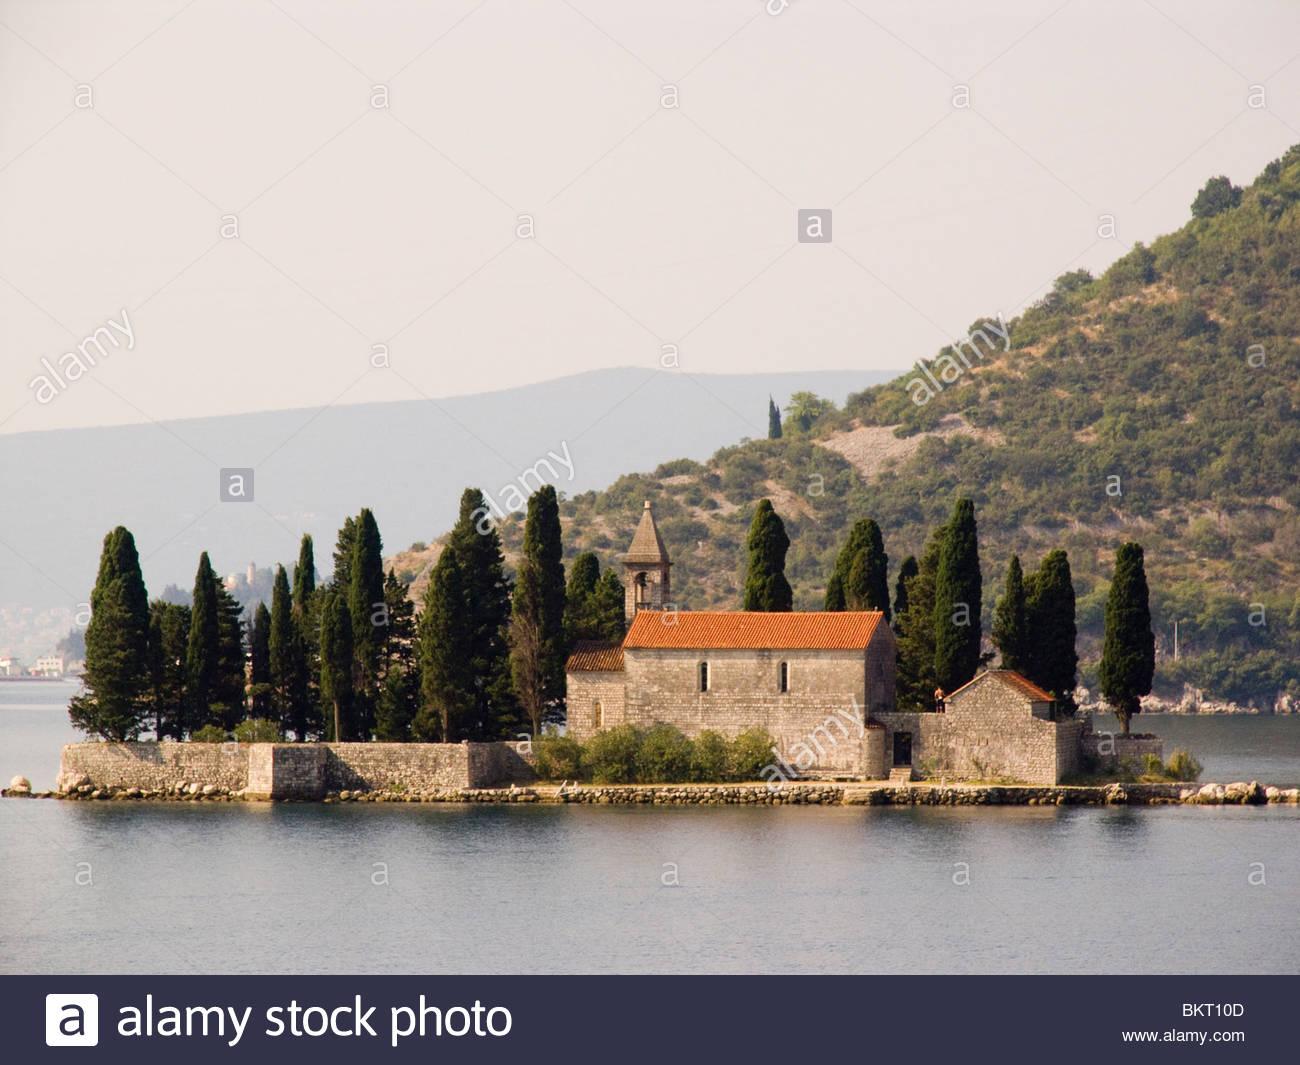 Monastère bénédictin,île de San Giorgio, Perast,Suede,Europe Photo Stock